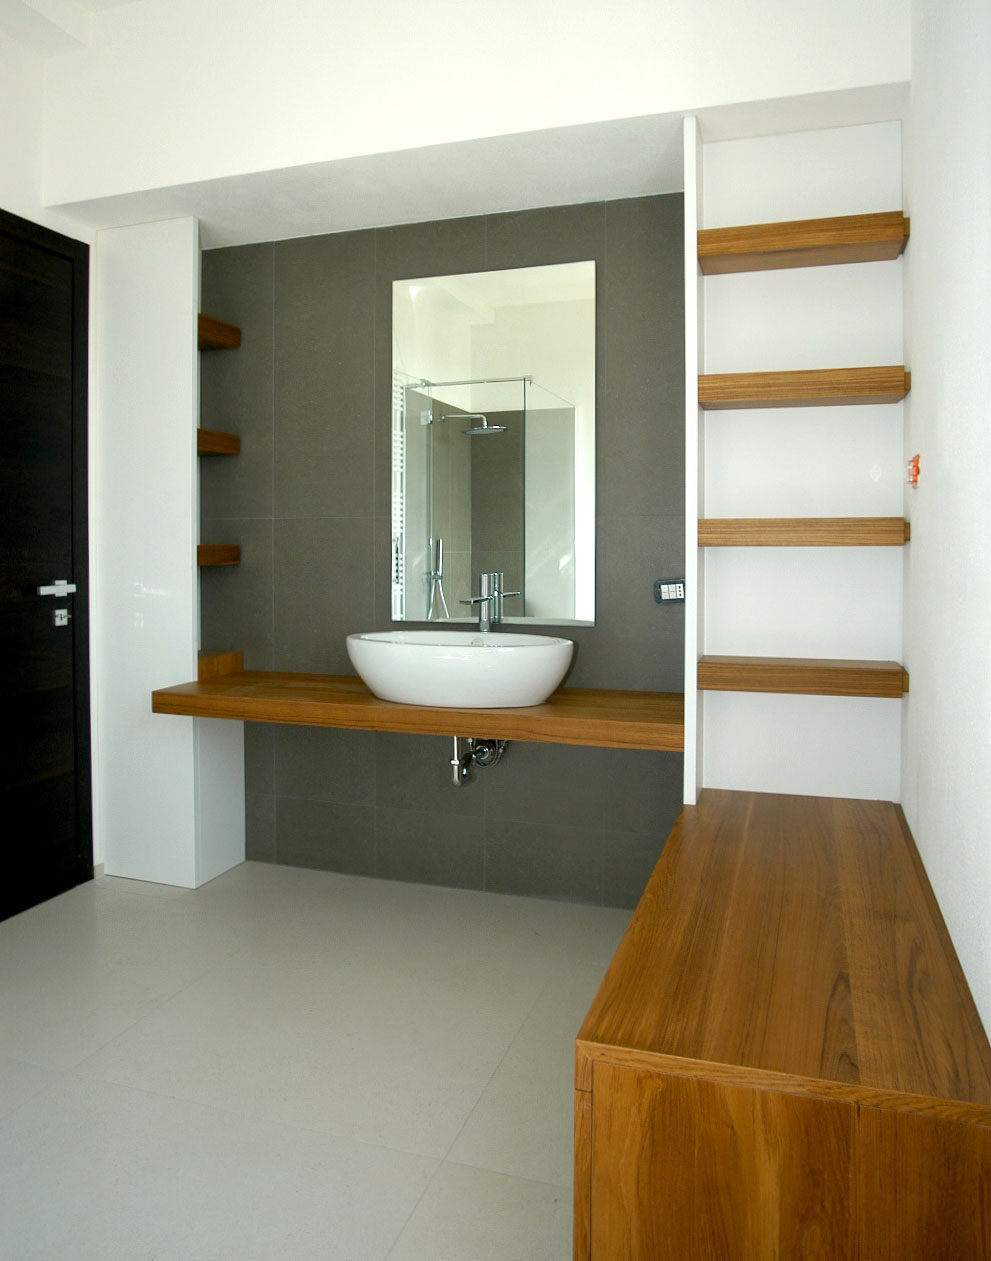 Bettoli arredi e pavimenti bagni bettoli arredi e pavimenti - Bagni con pavimento in legno ...